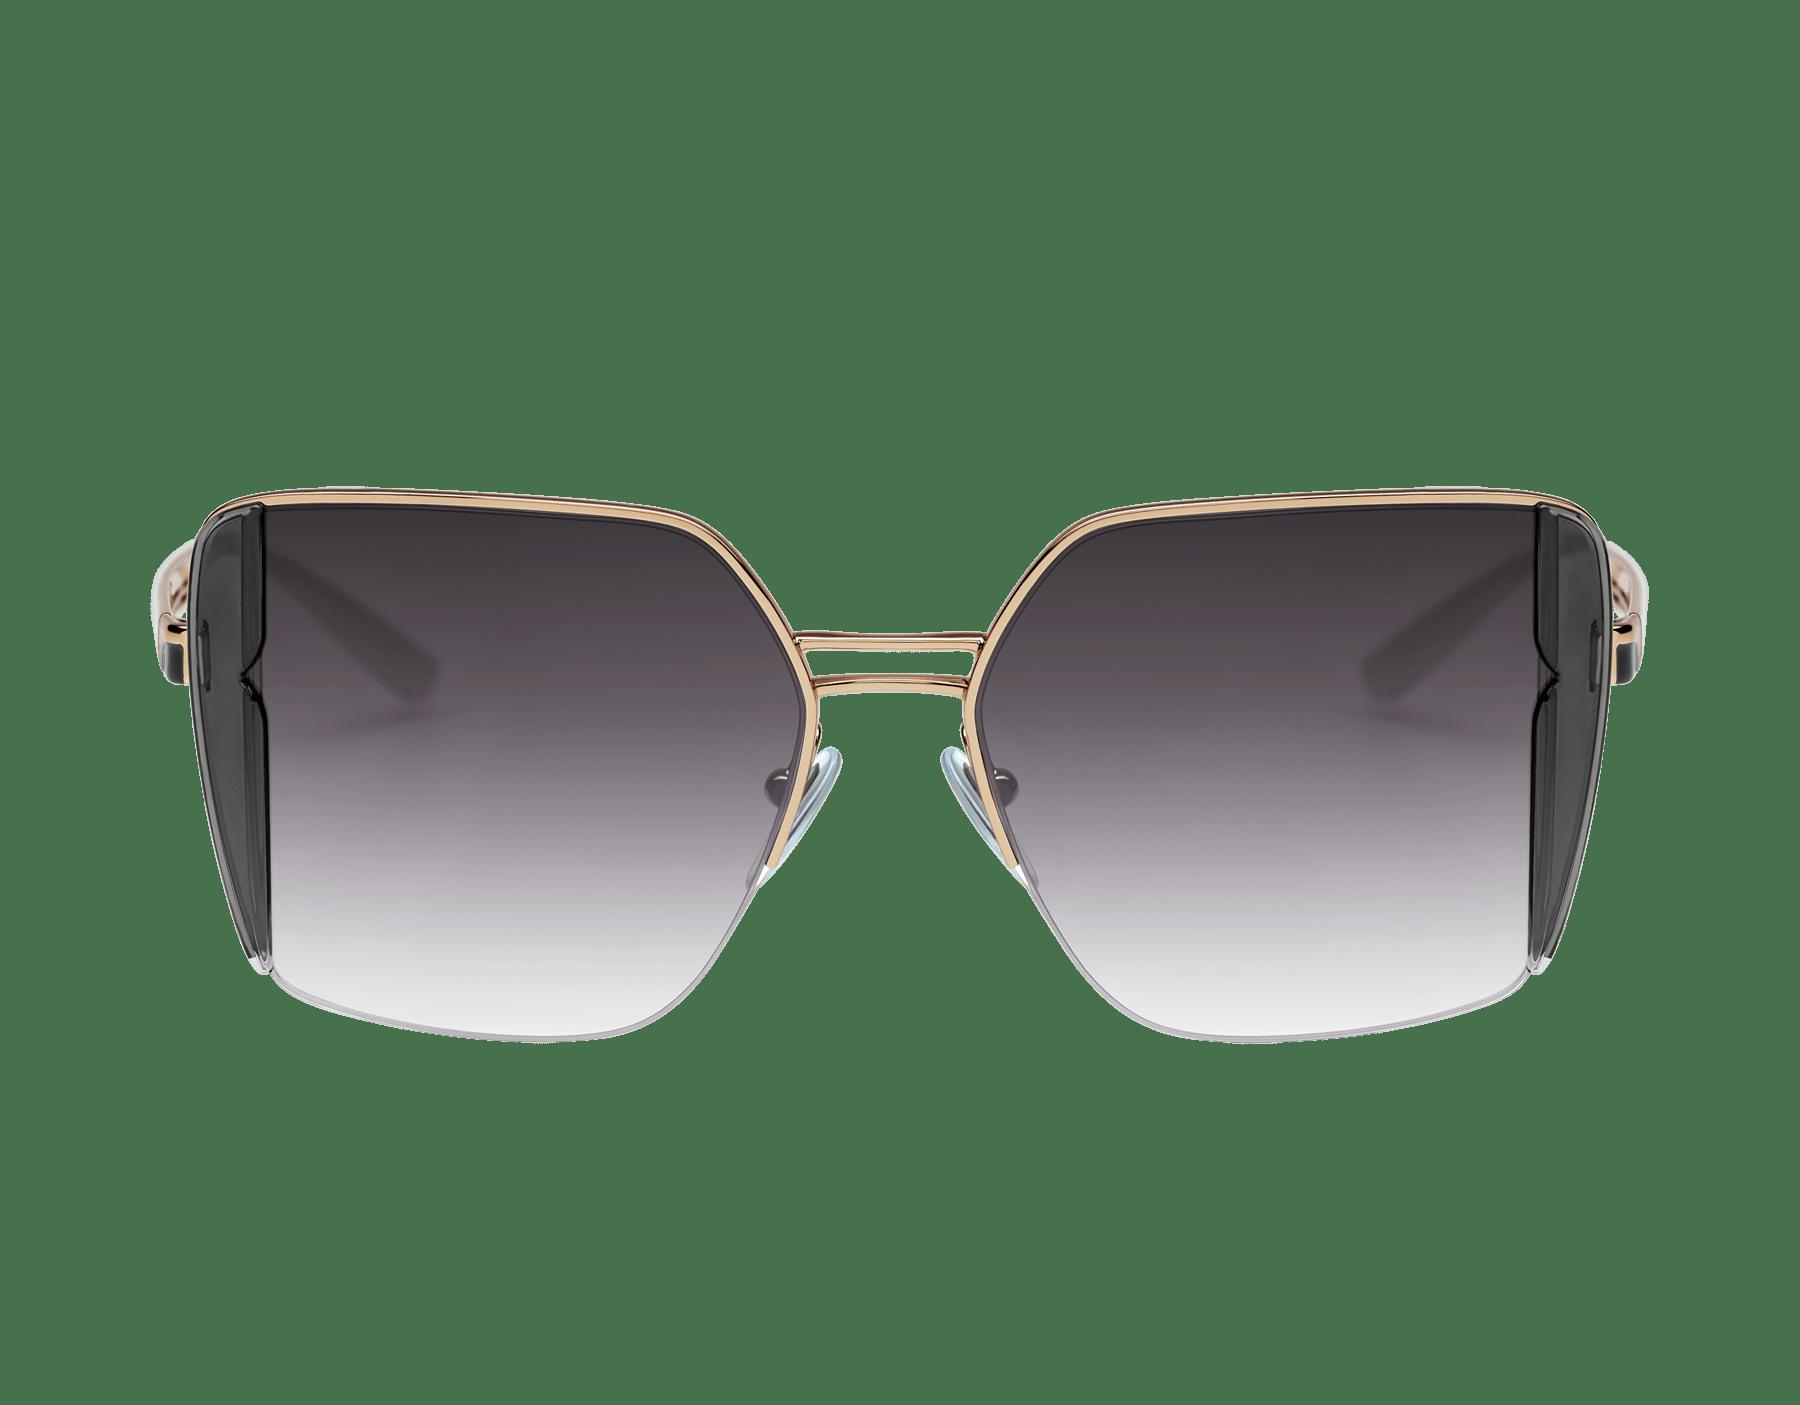 Bulgari B.zero1 B.purebright metal squared sunglasses. 903960 image 2